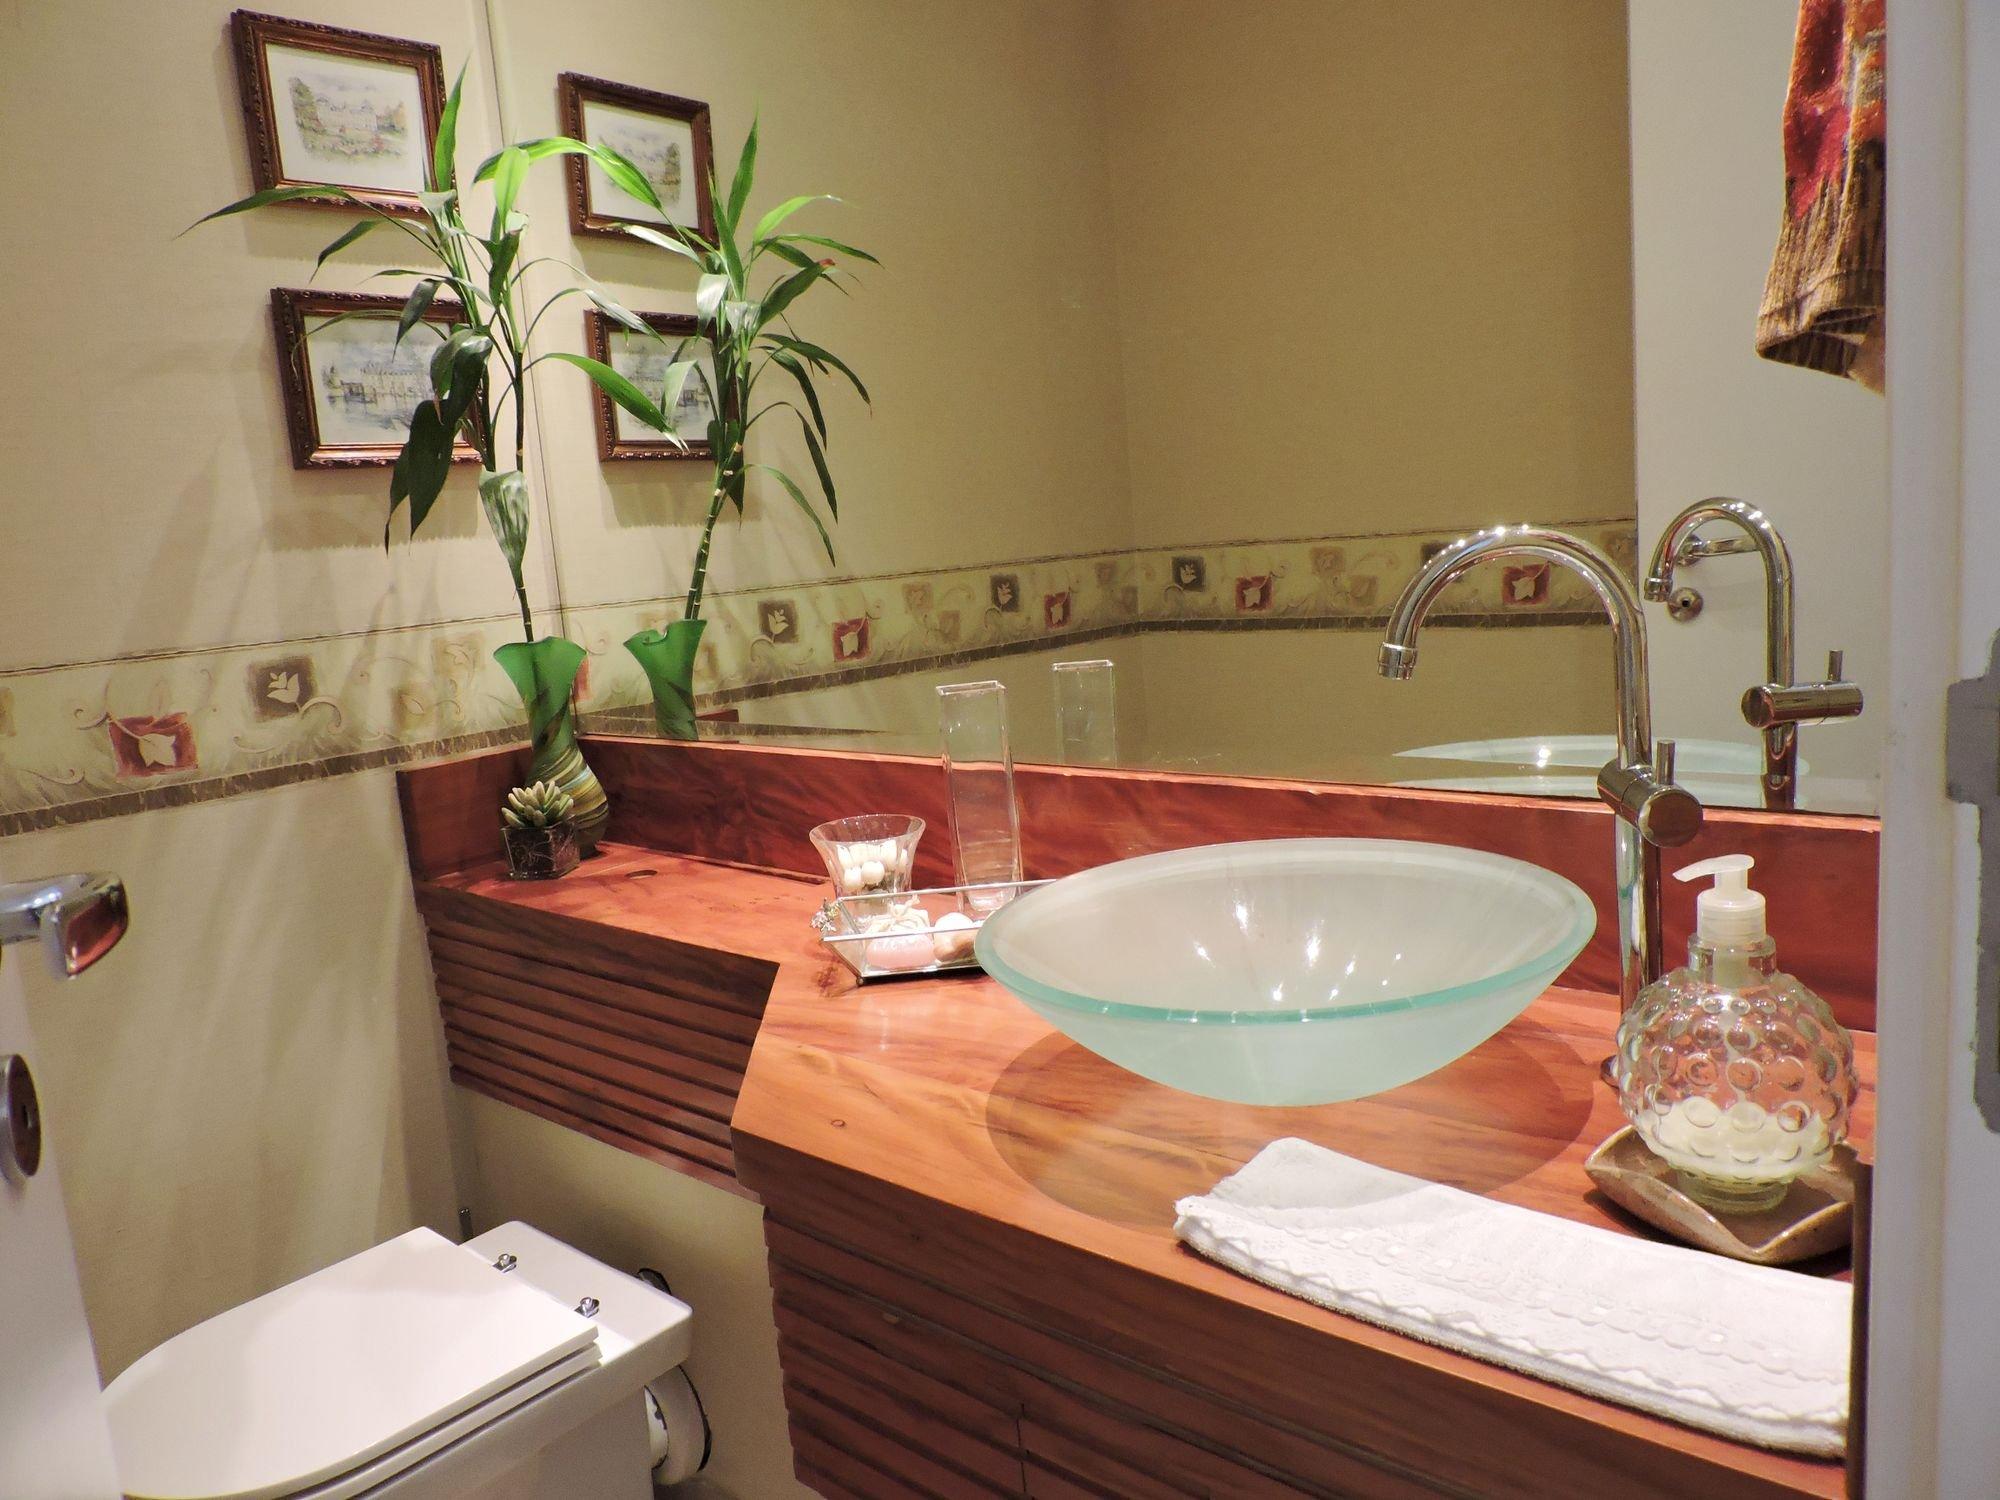 Foto de Banheiro com vaso de planta, vaso sanitário, pia, vaso, garrafa, tigela, xícara